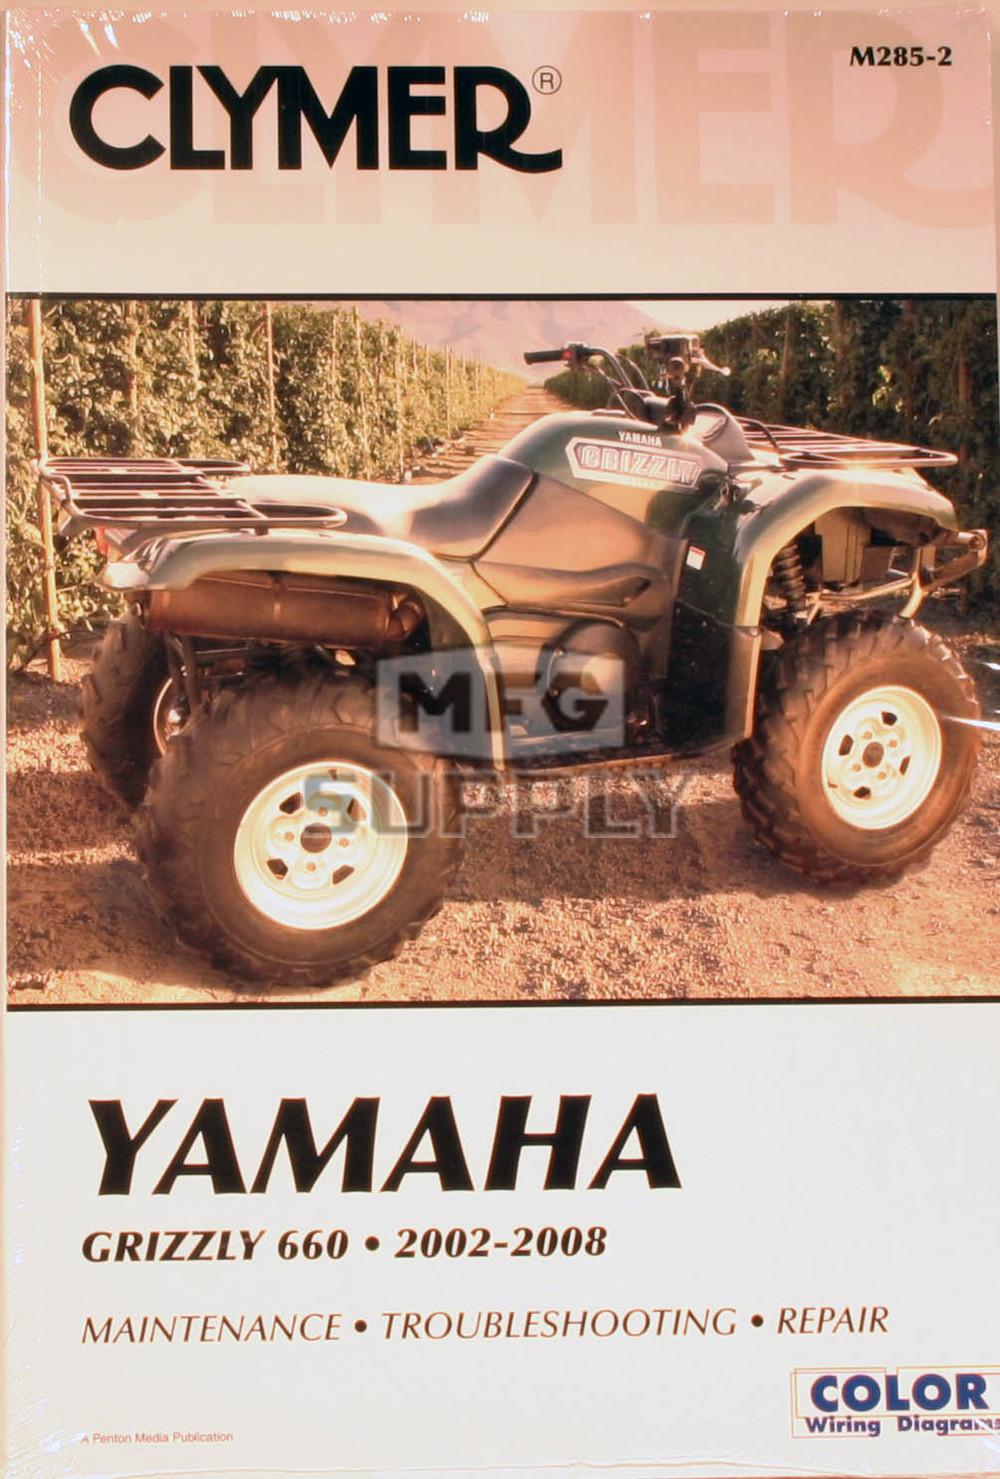 cm285 02 08 yamaha grizzly 660 repair maintenance manual atv rh mfgsupply com